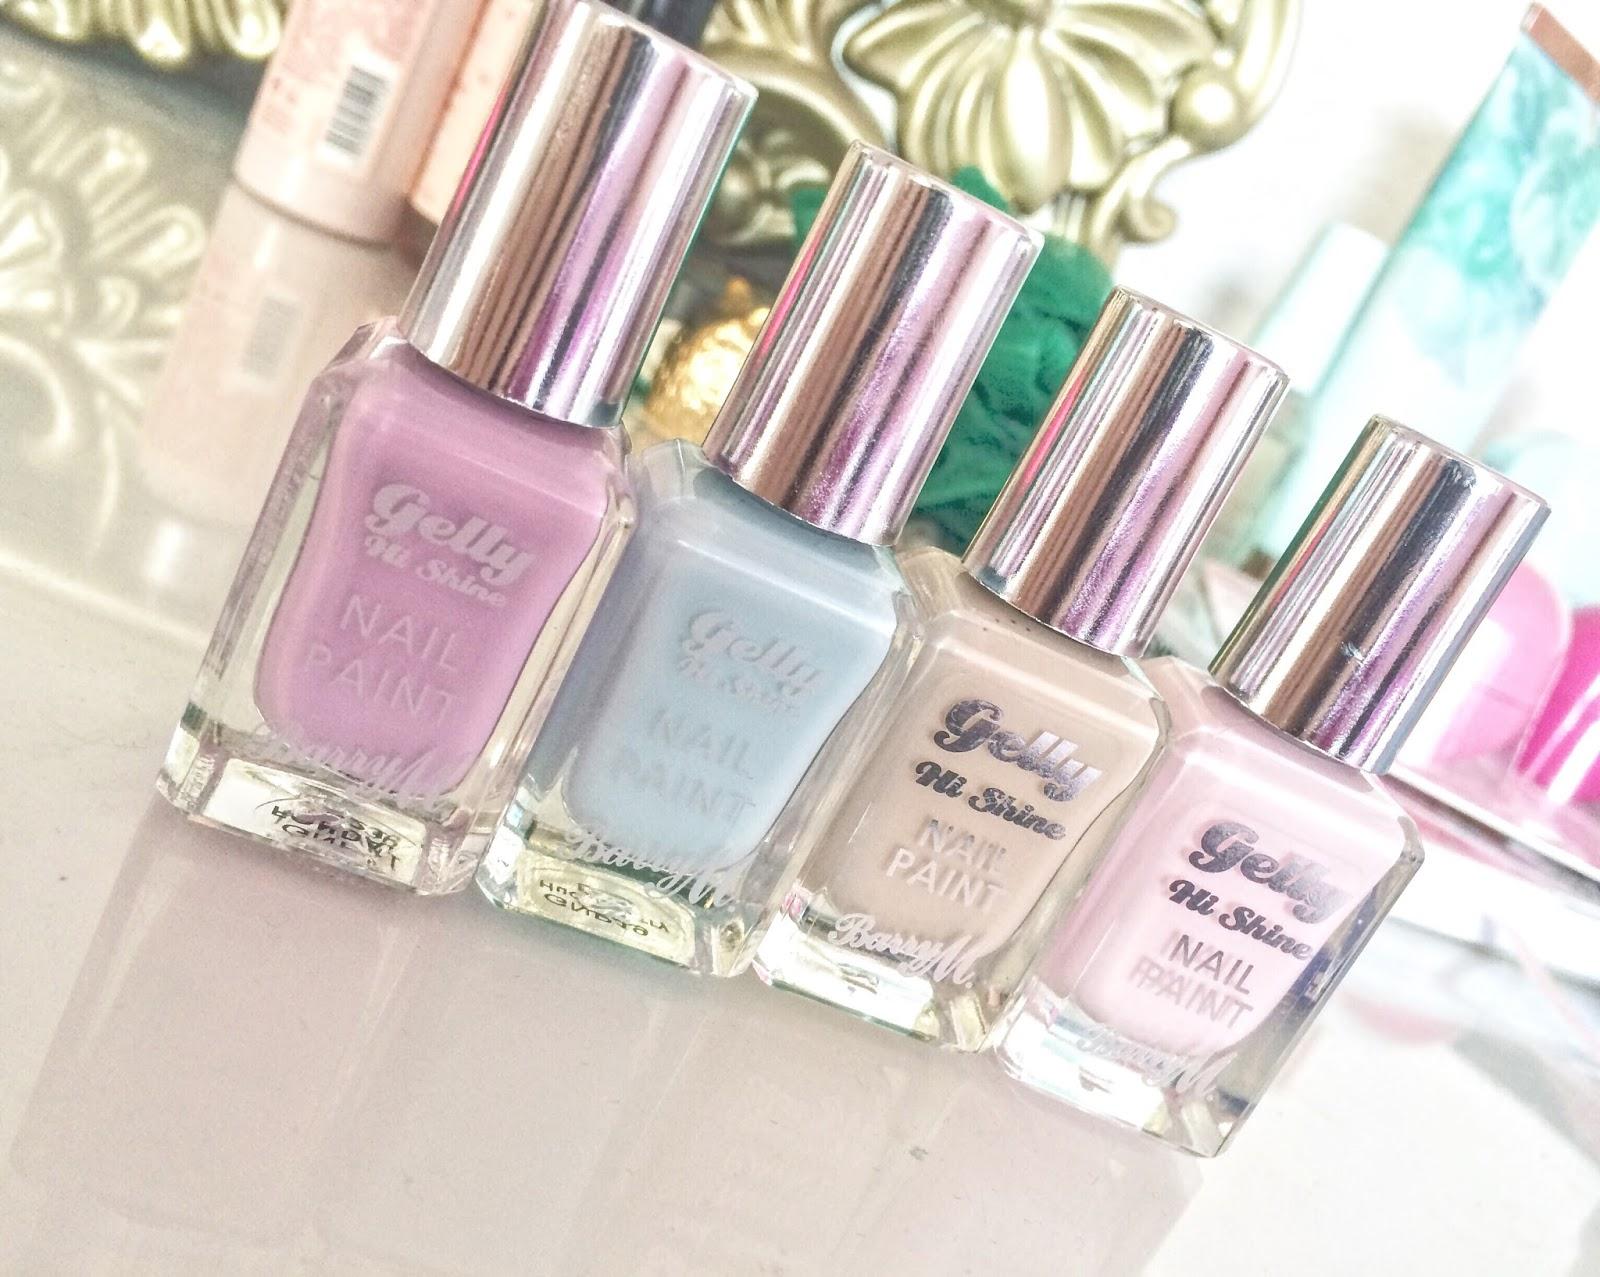 Pretty Pastel Nail Polishes | Barry M